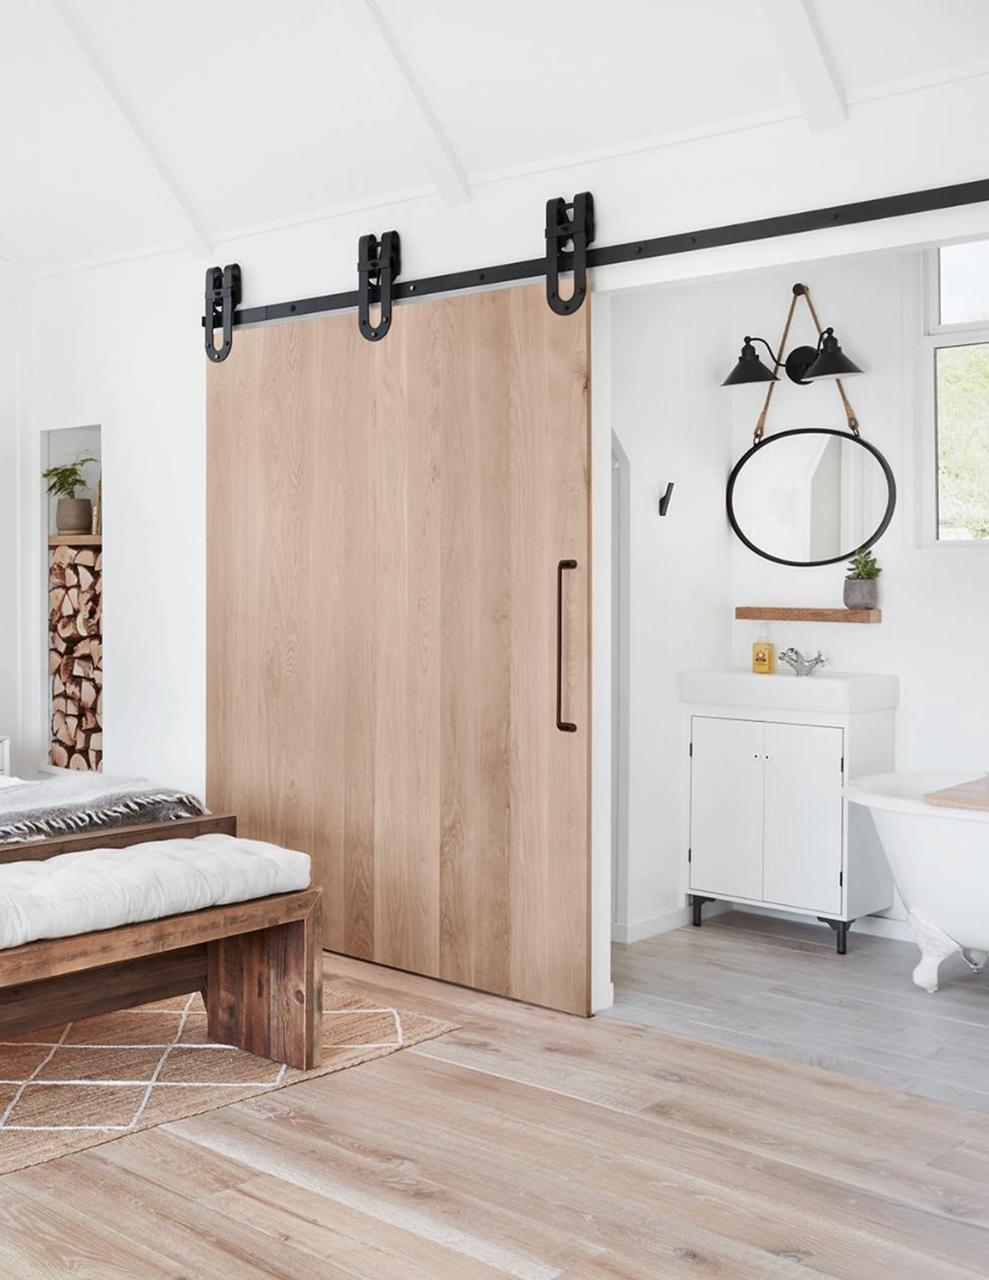 Custom oak Slab Barn Door In bedroom connecting to master to bathroom